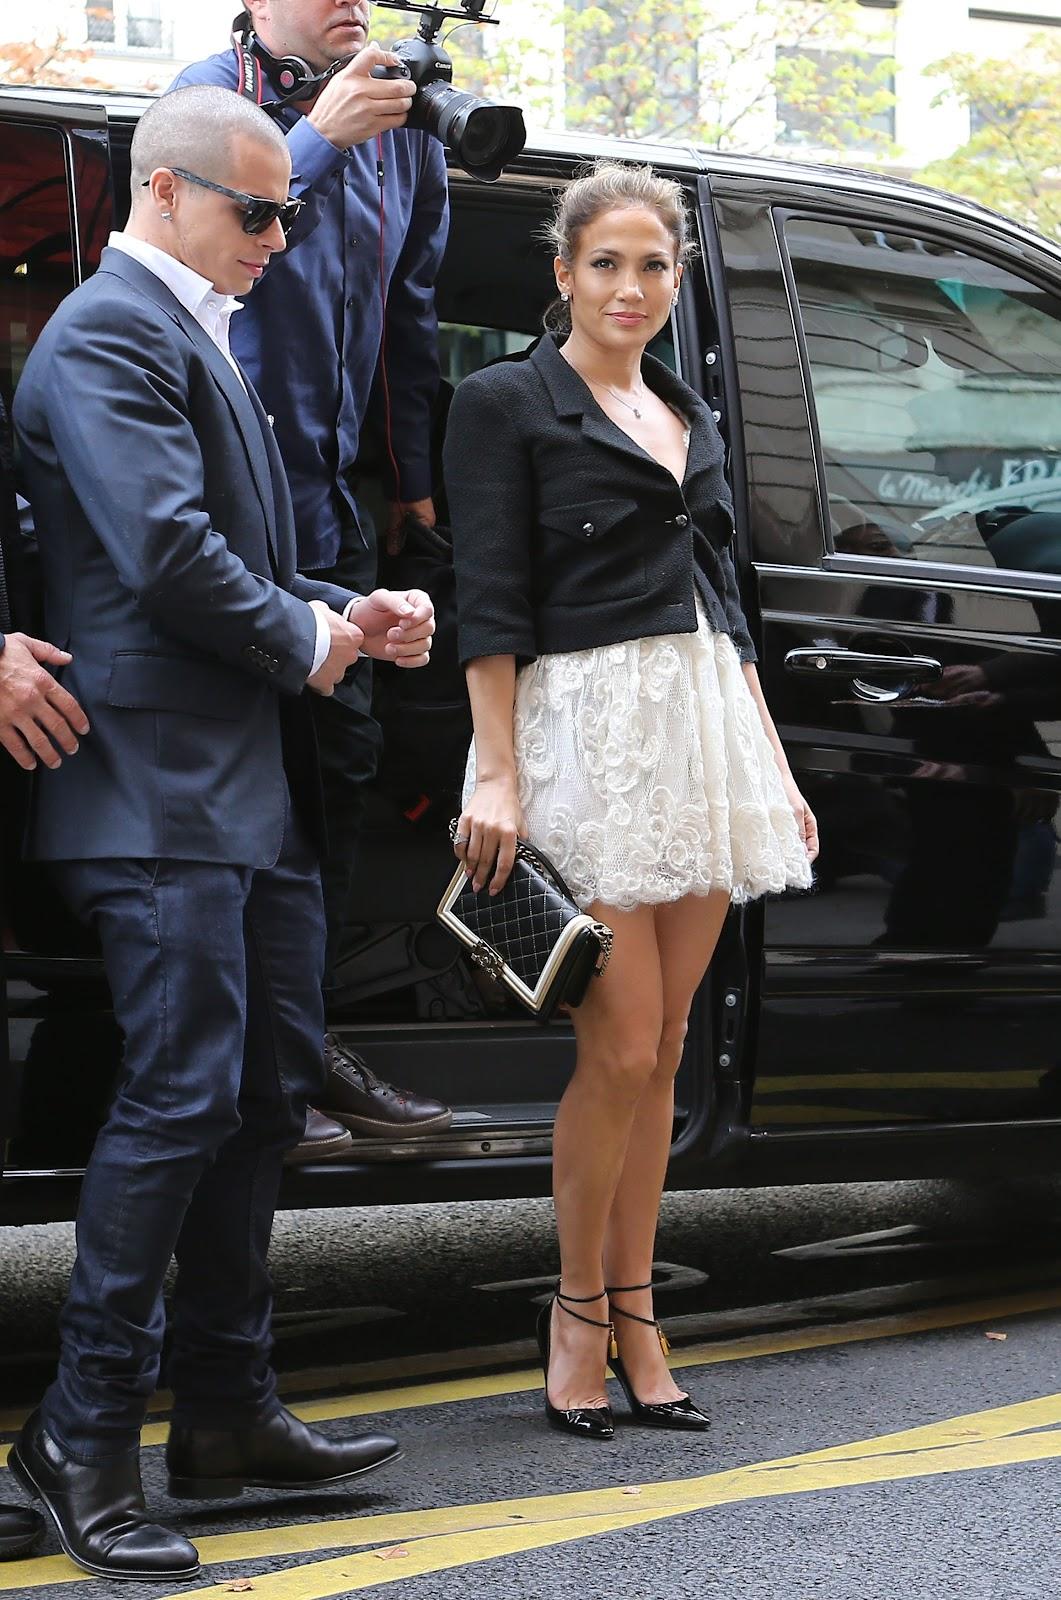 http://4.bp.blogspot.com/-Lw0j8OUDn_4/UGrsMZ7WDYI/AAAAAAAAP5Q/9nXyCC7UnDA/s1600/Jennifer+Lopez++October+2012+%27Chanel%27+Fashion+Show+-+01.jpg